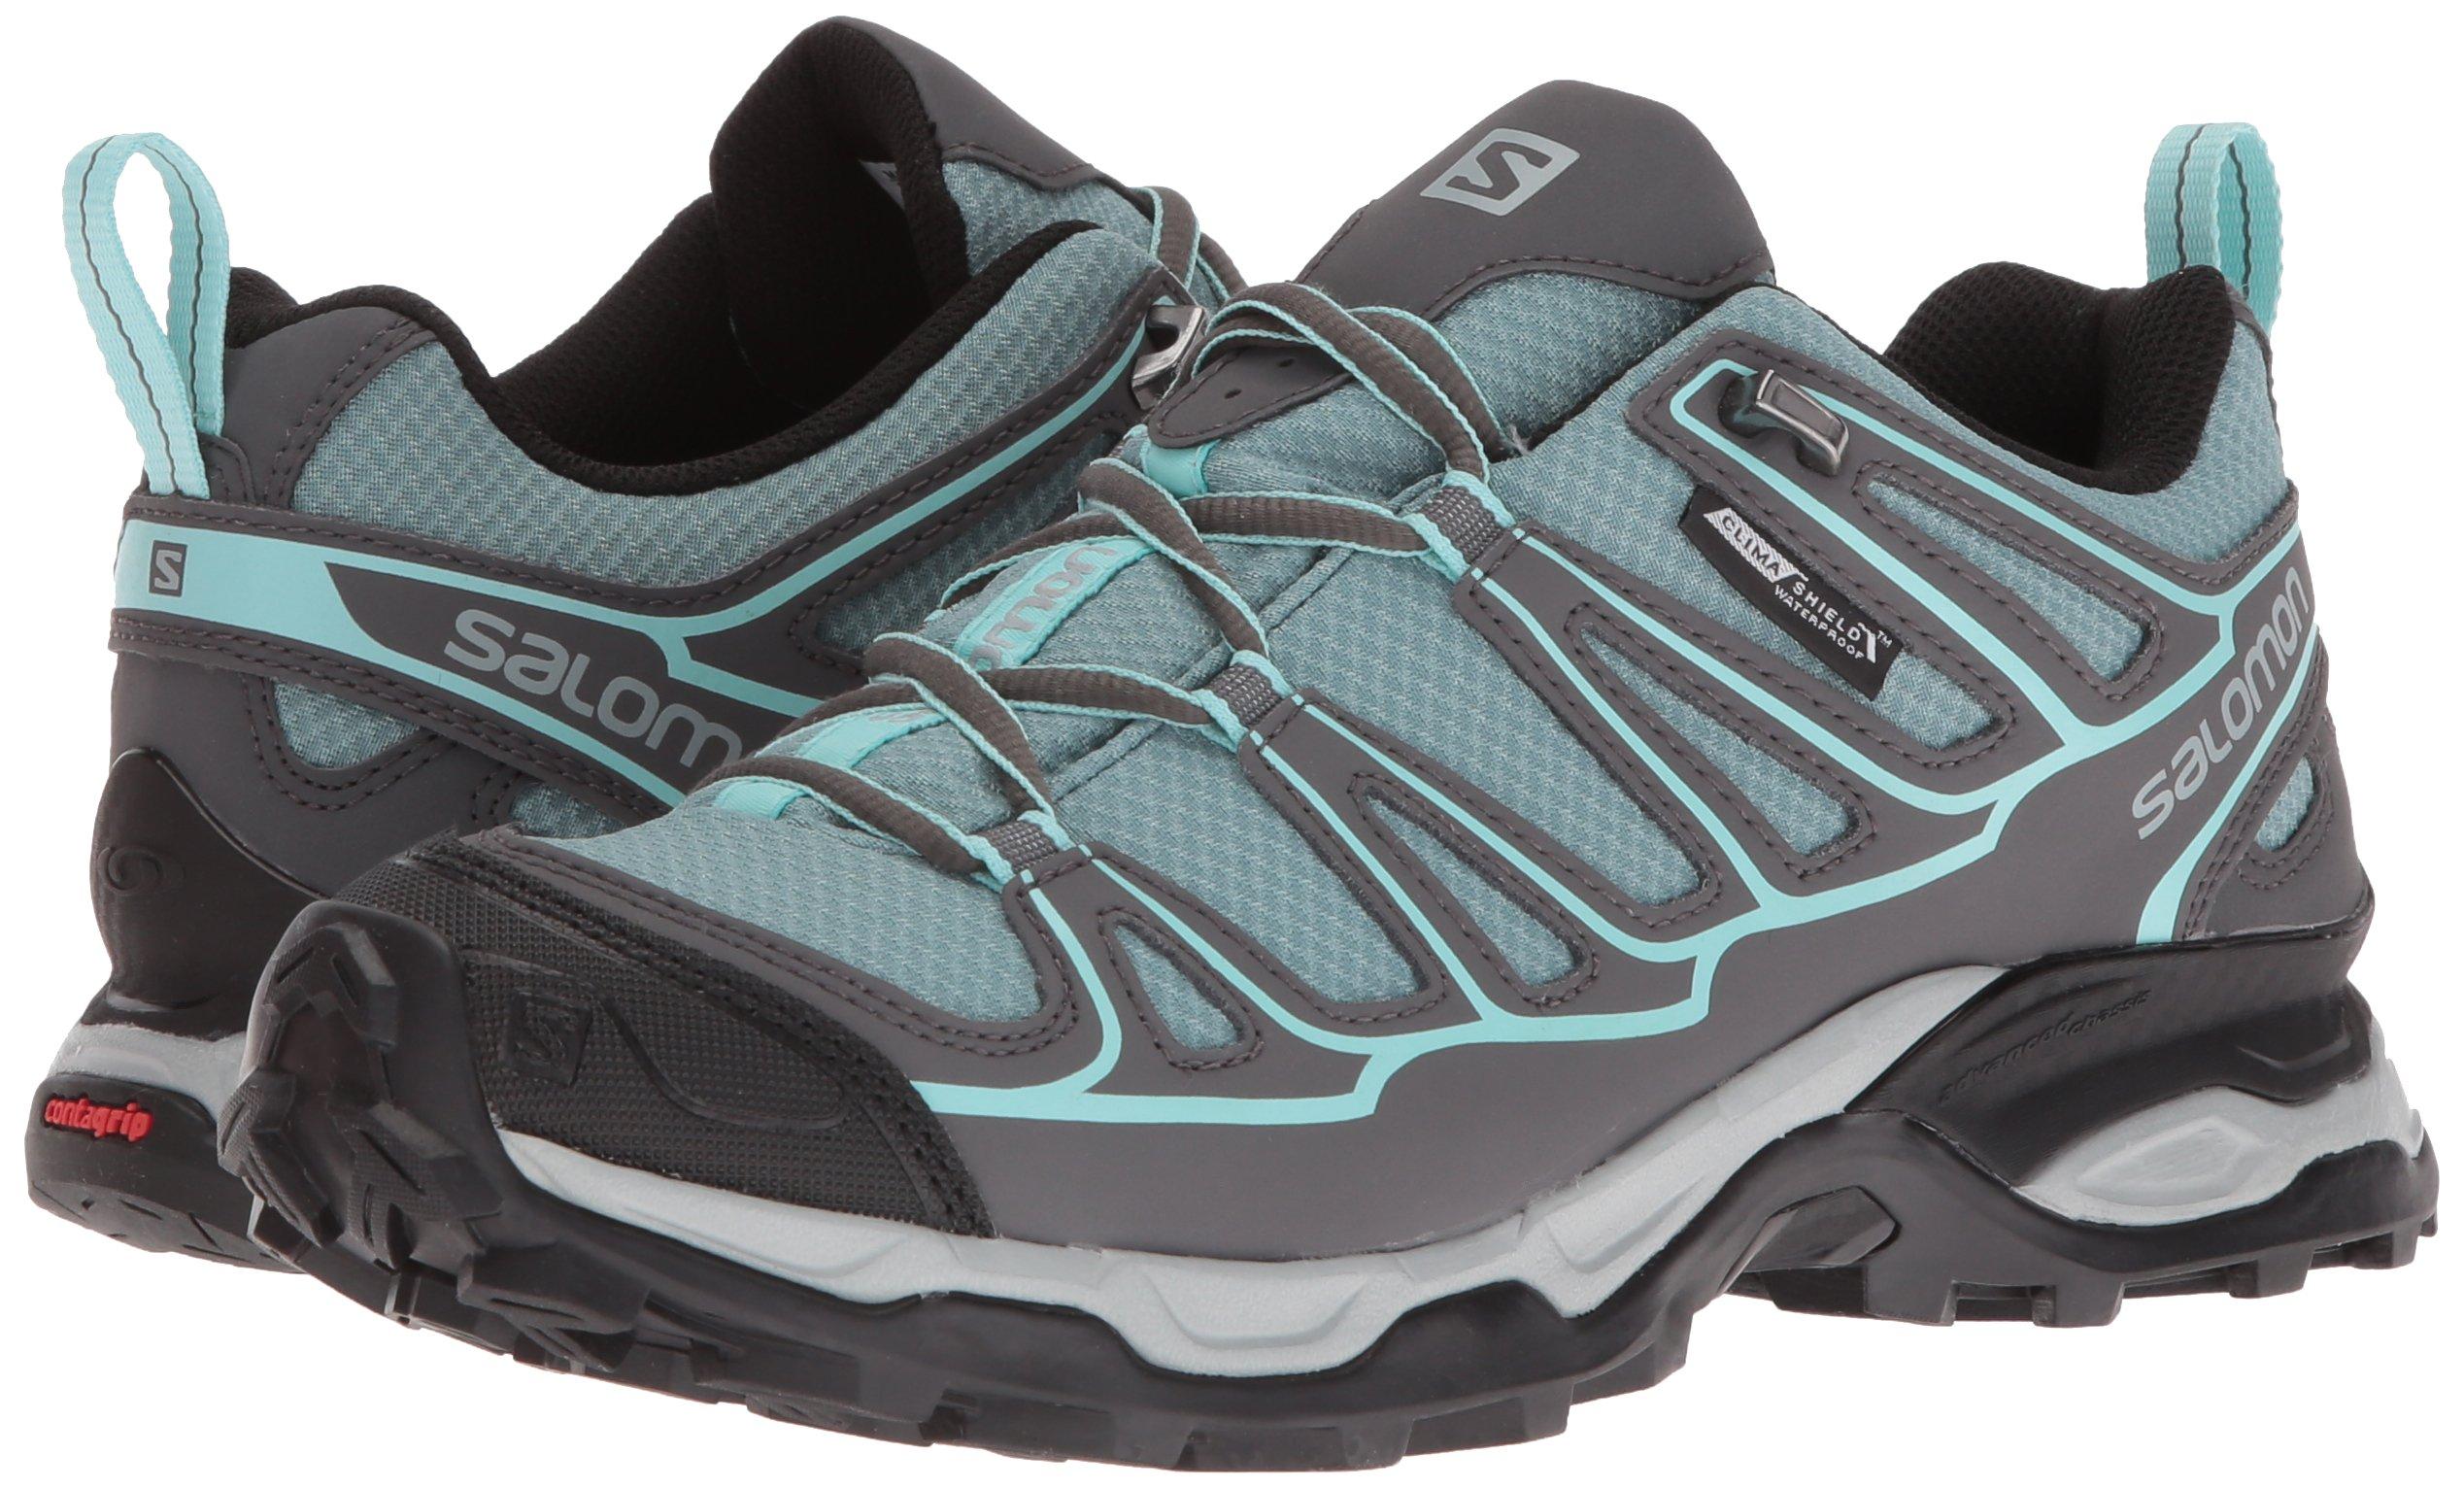 81e%2BMhlC7PL - SALOMON Women's Hiking Shoe